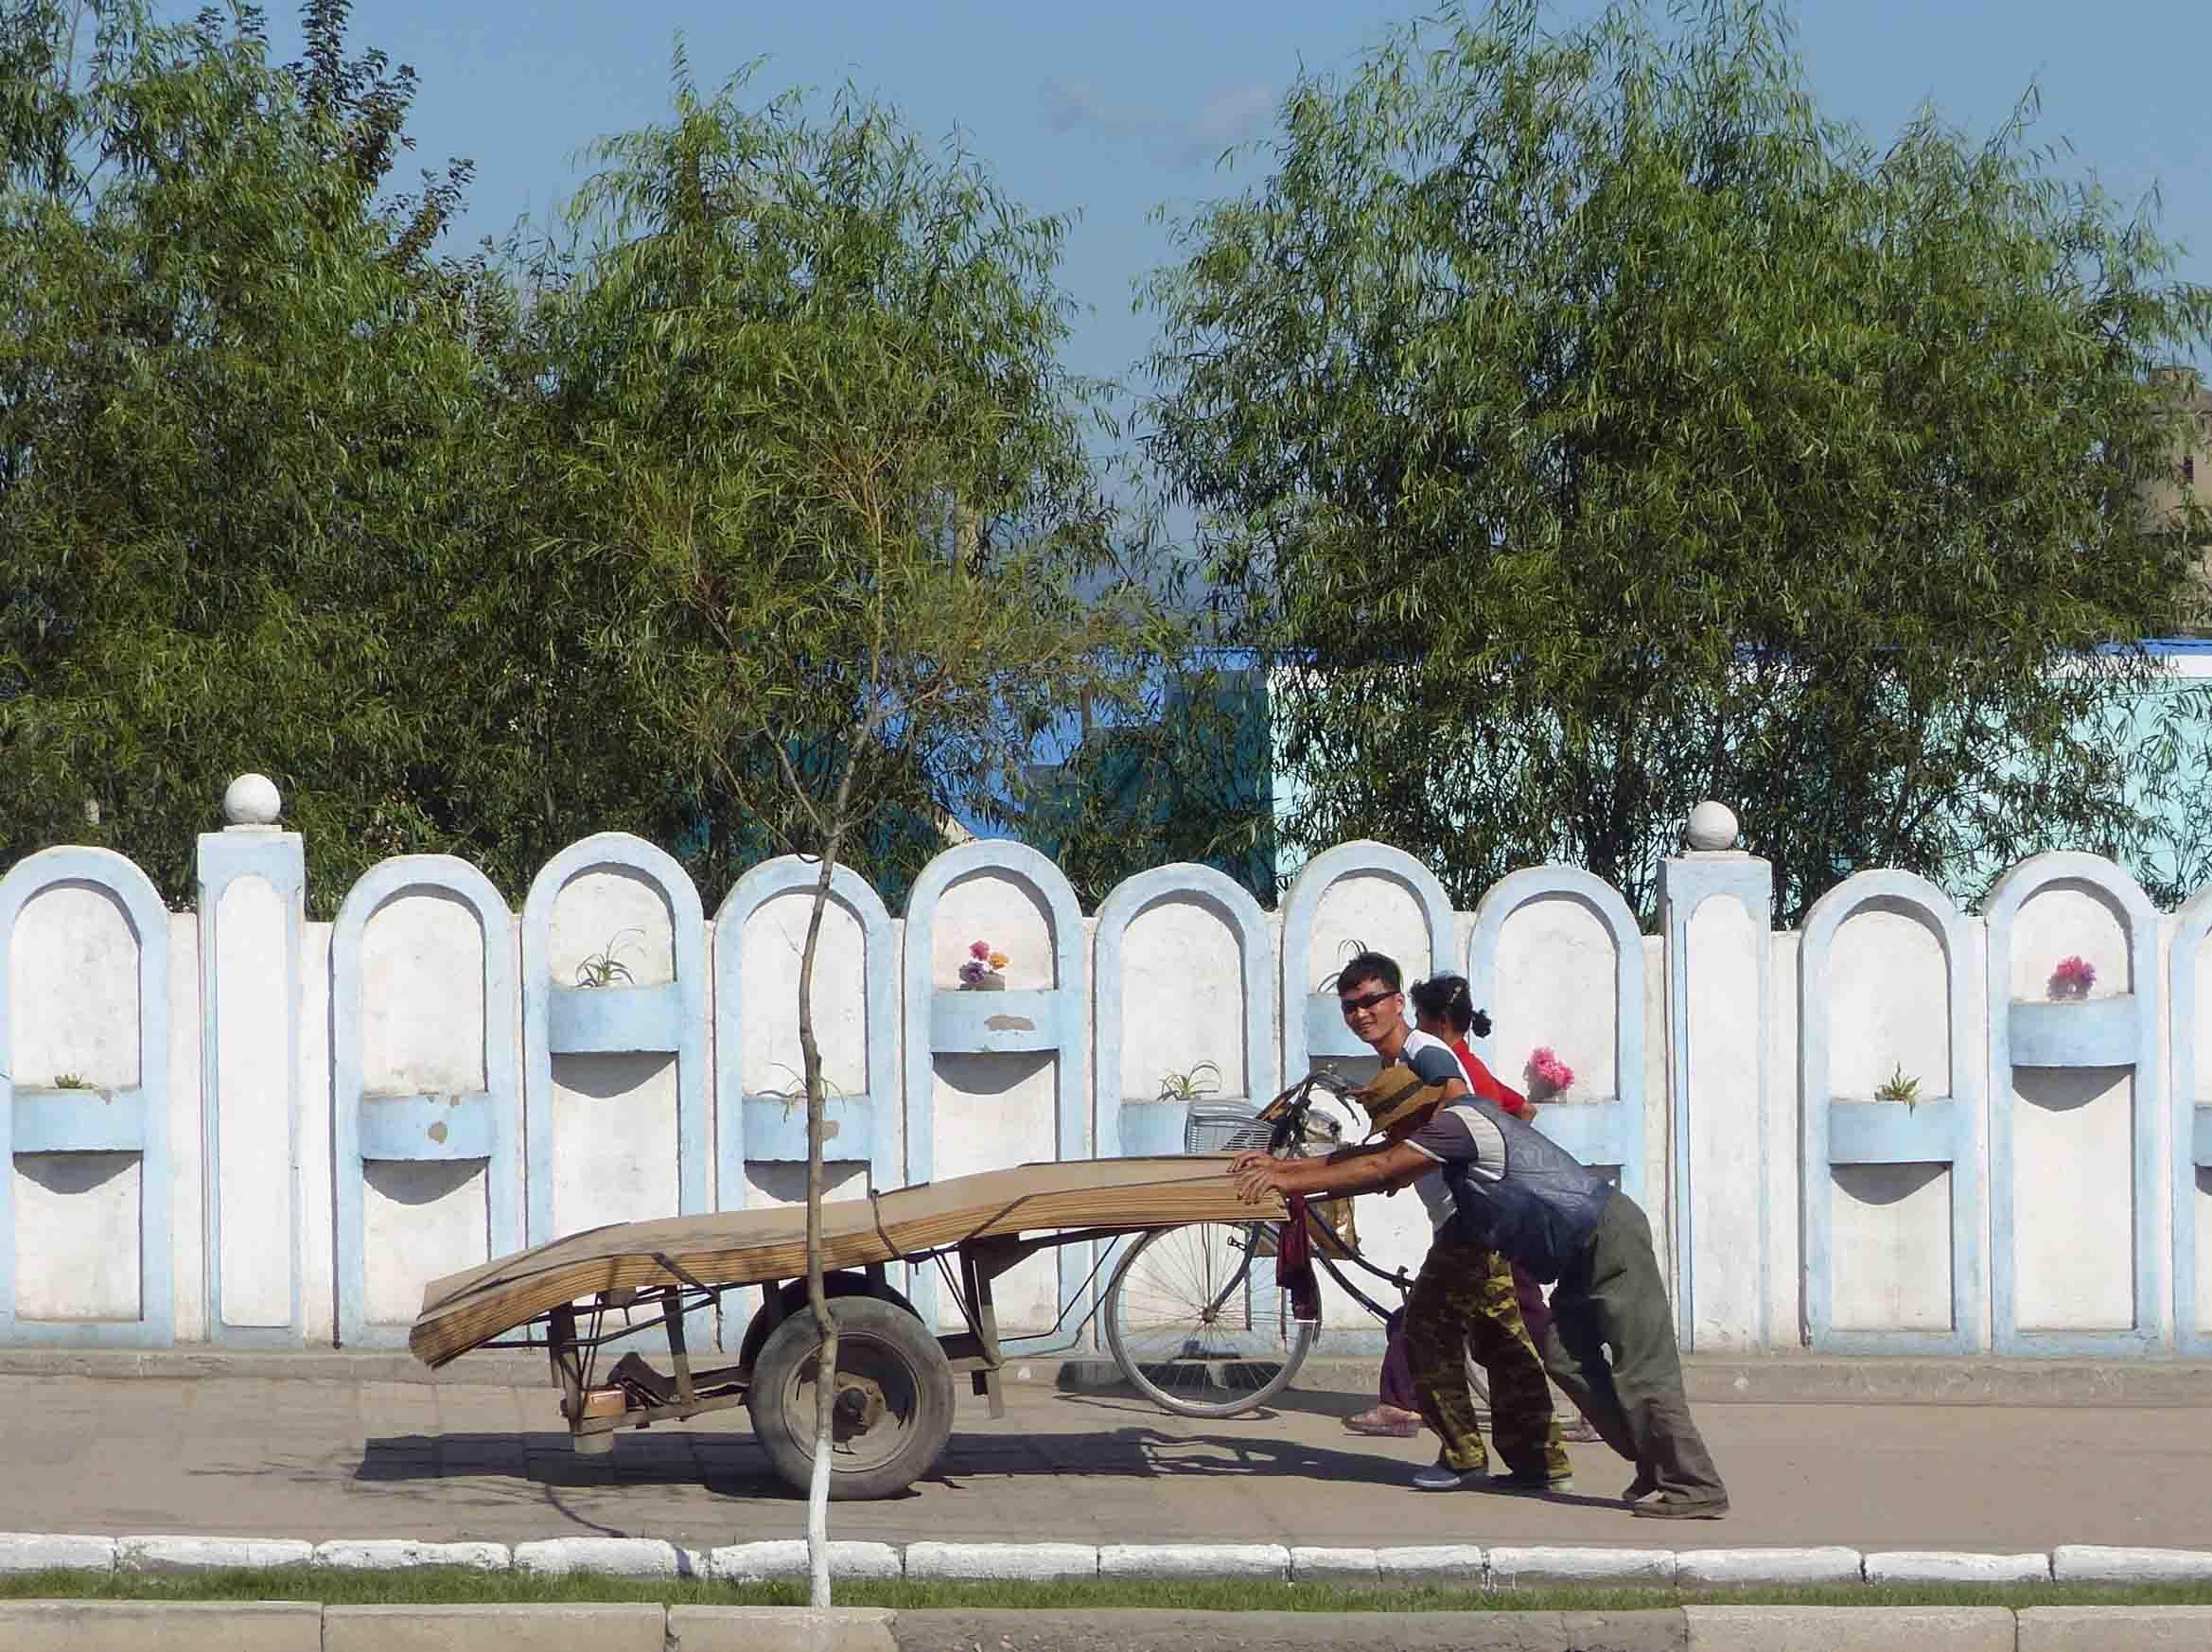 Men pushing cart with large piece of wood